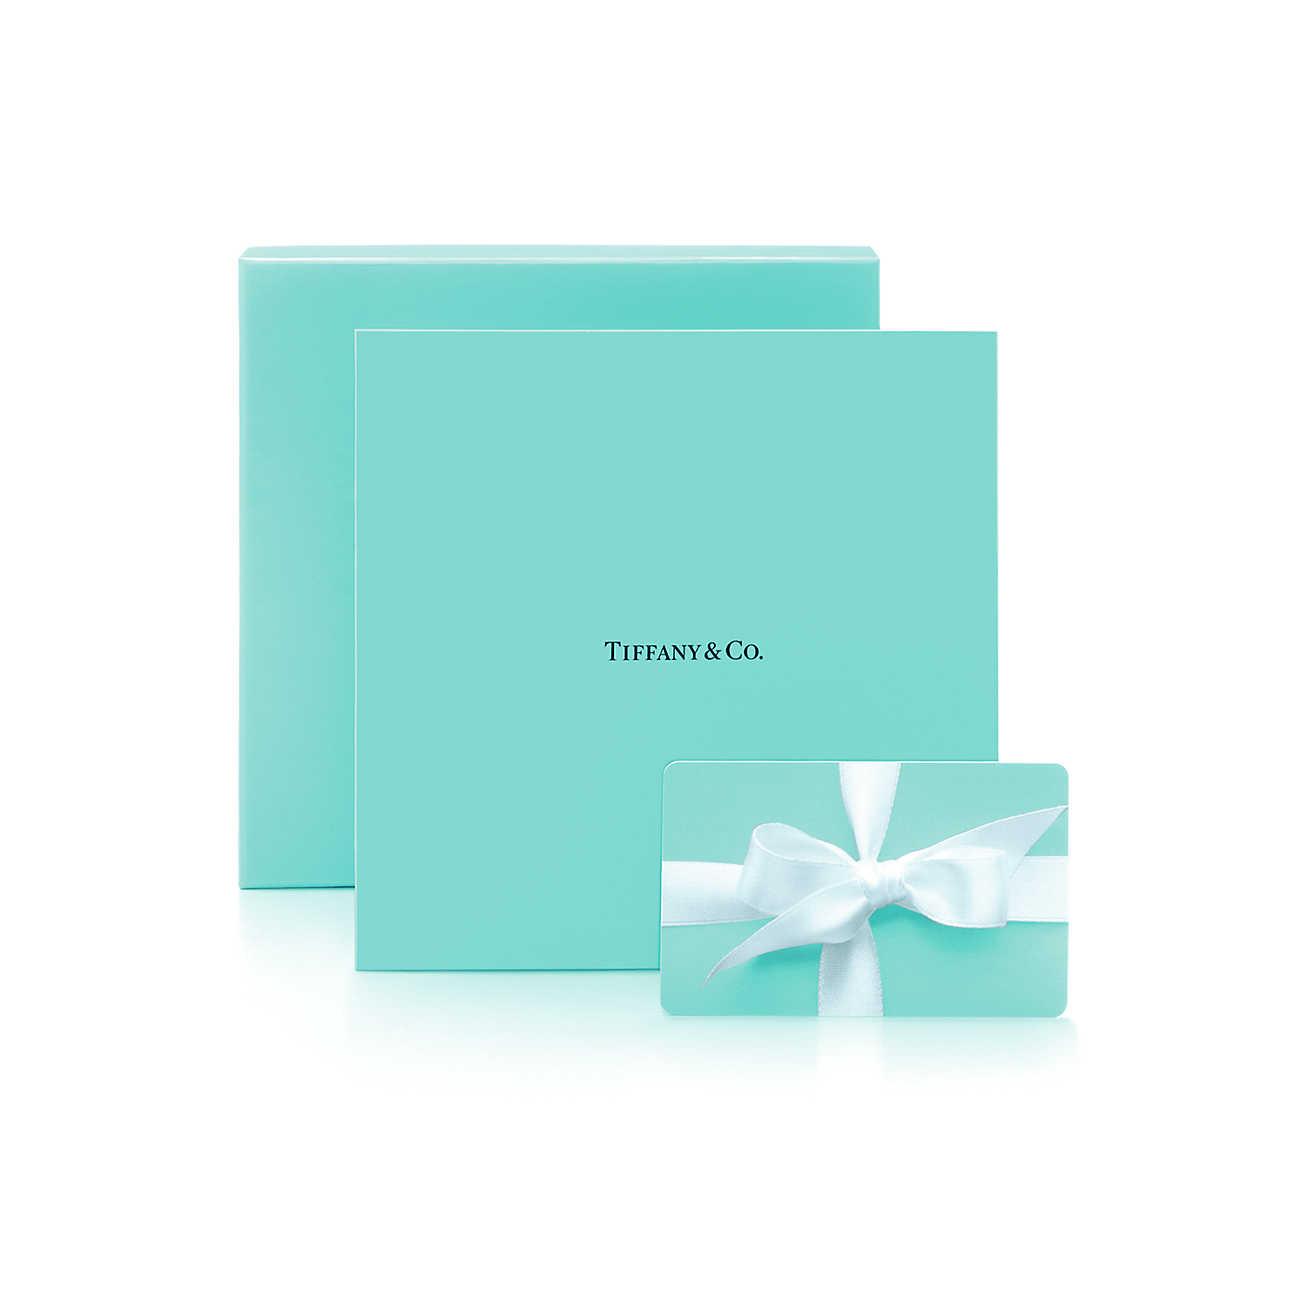 Tiffany Gift Card